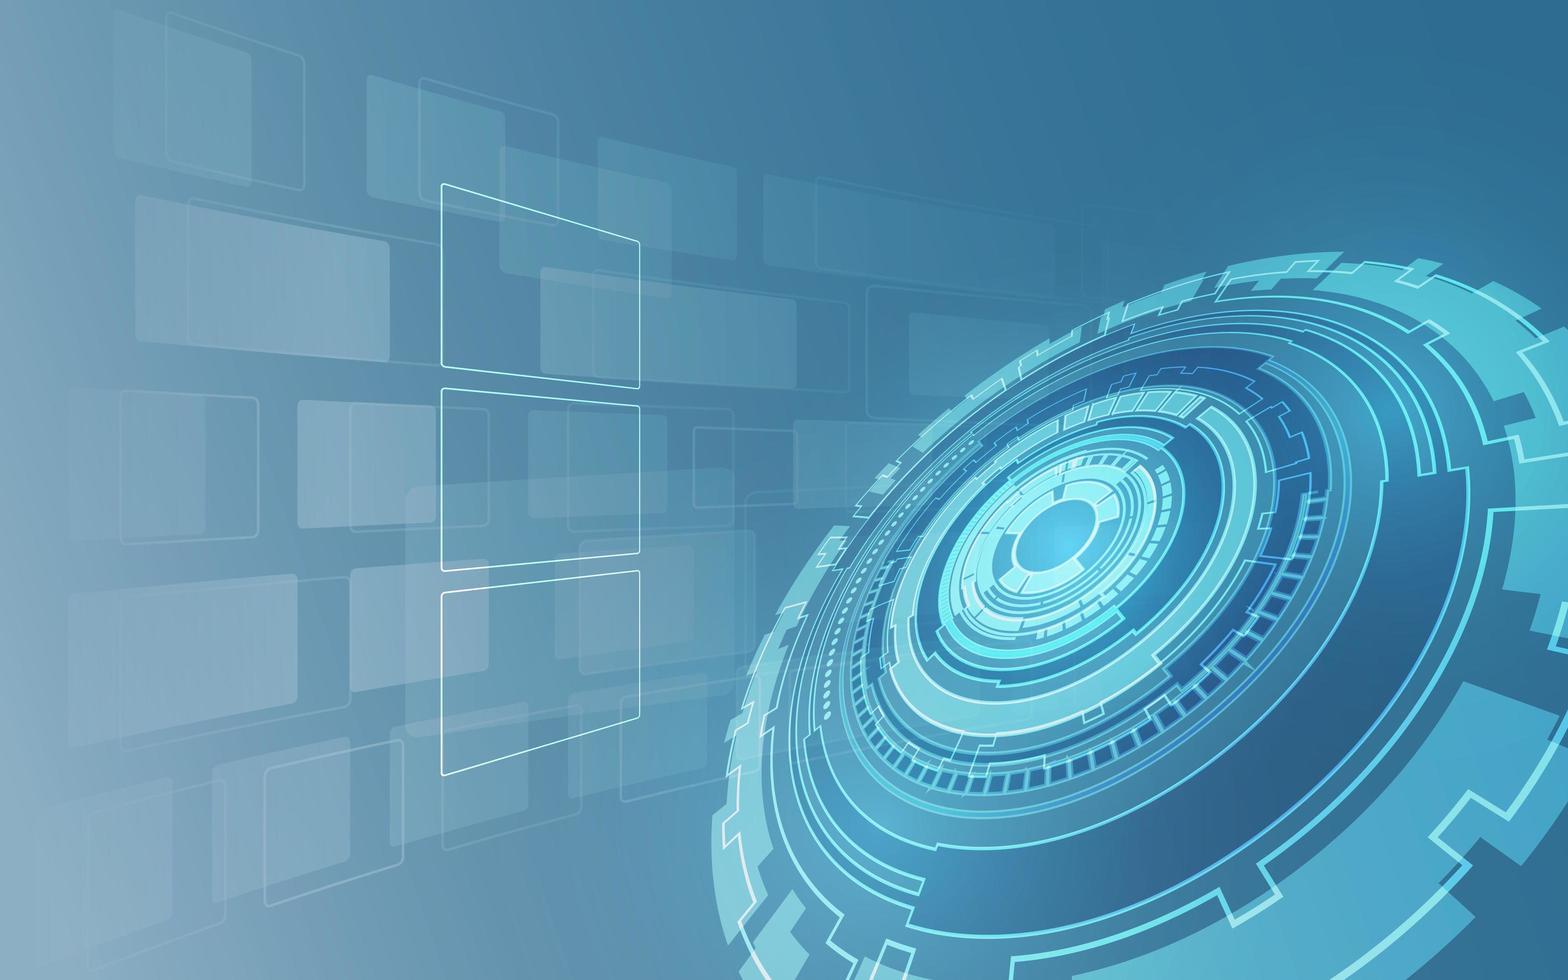 fond de concept futuriste numérique tech sci fi vecteur